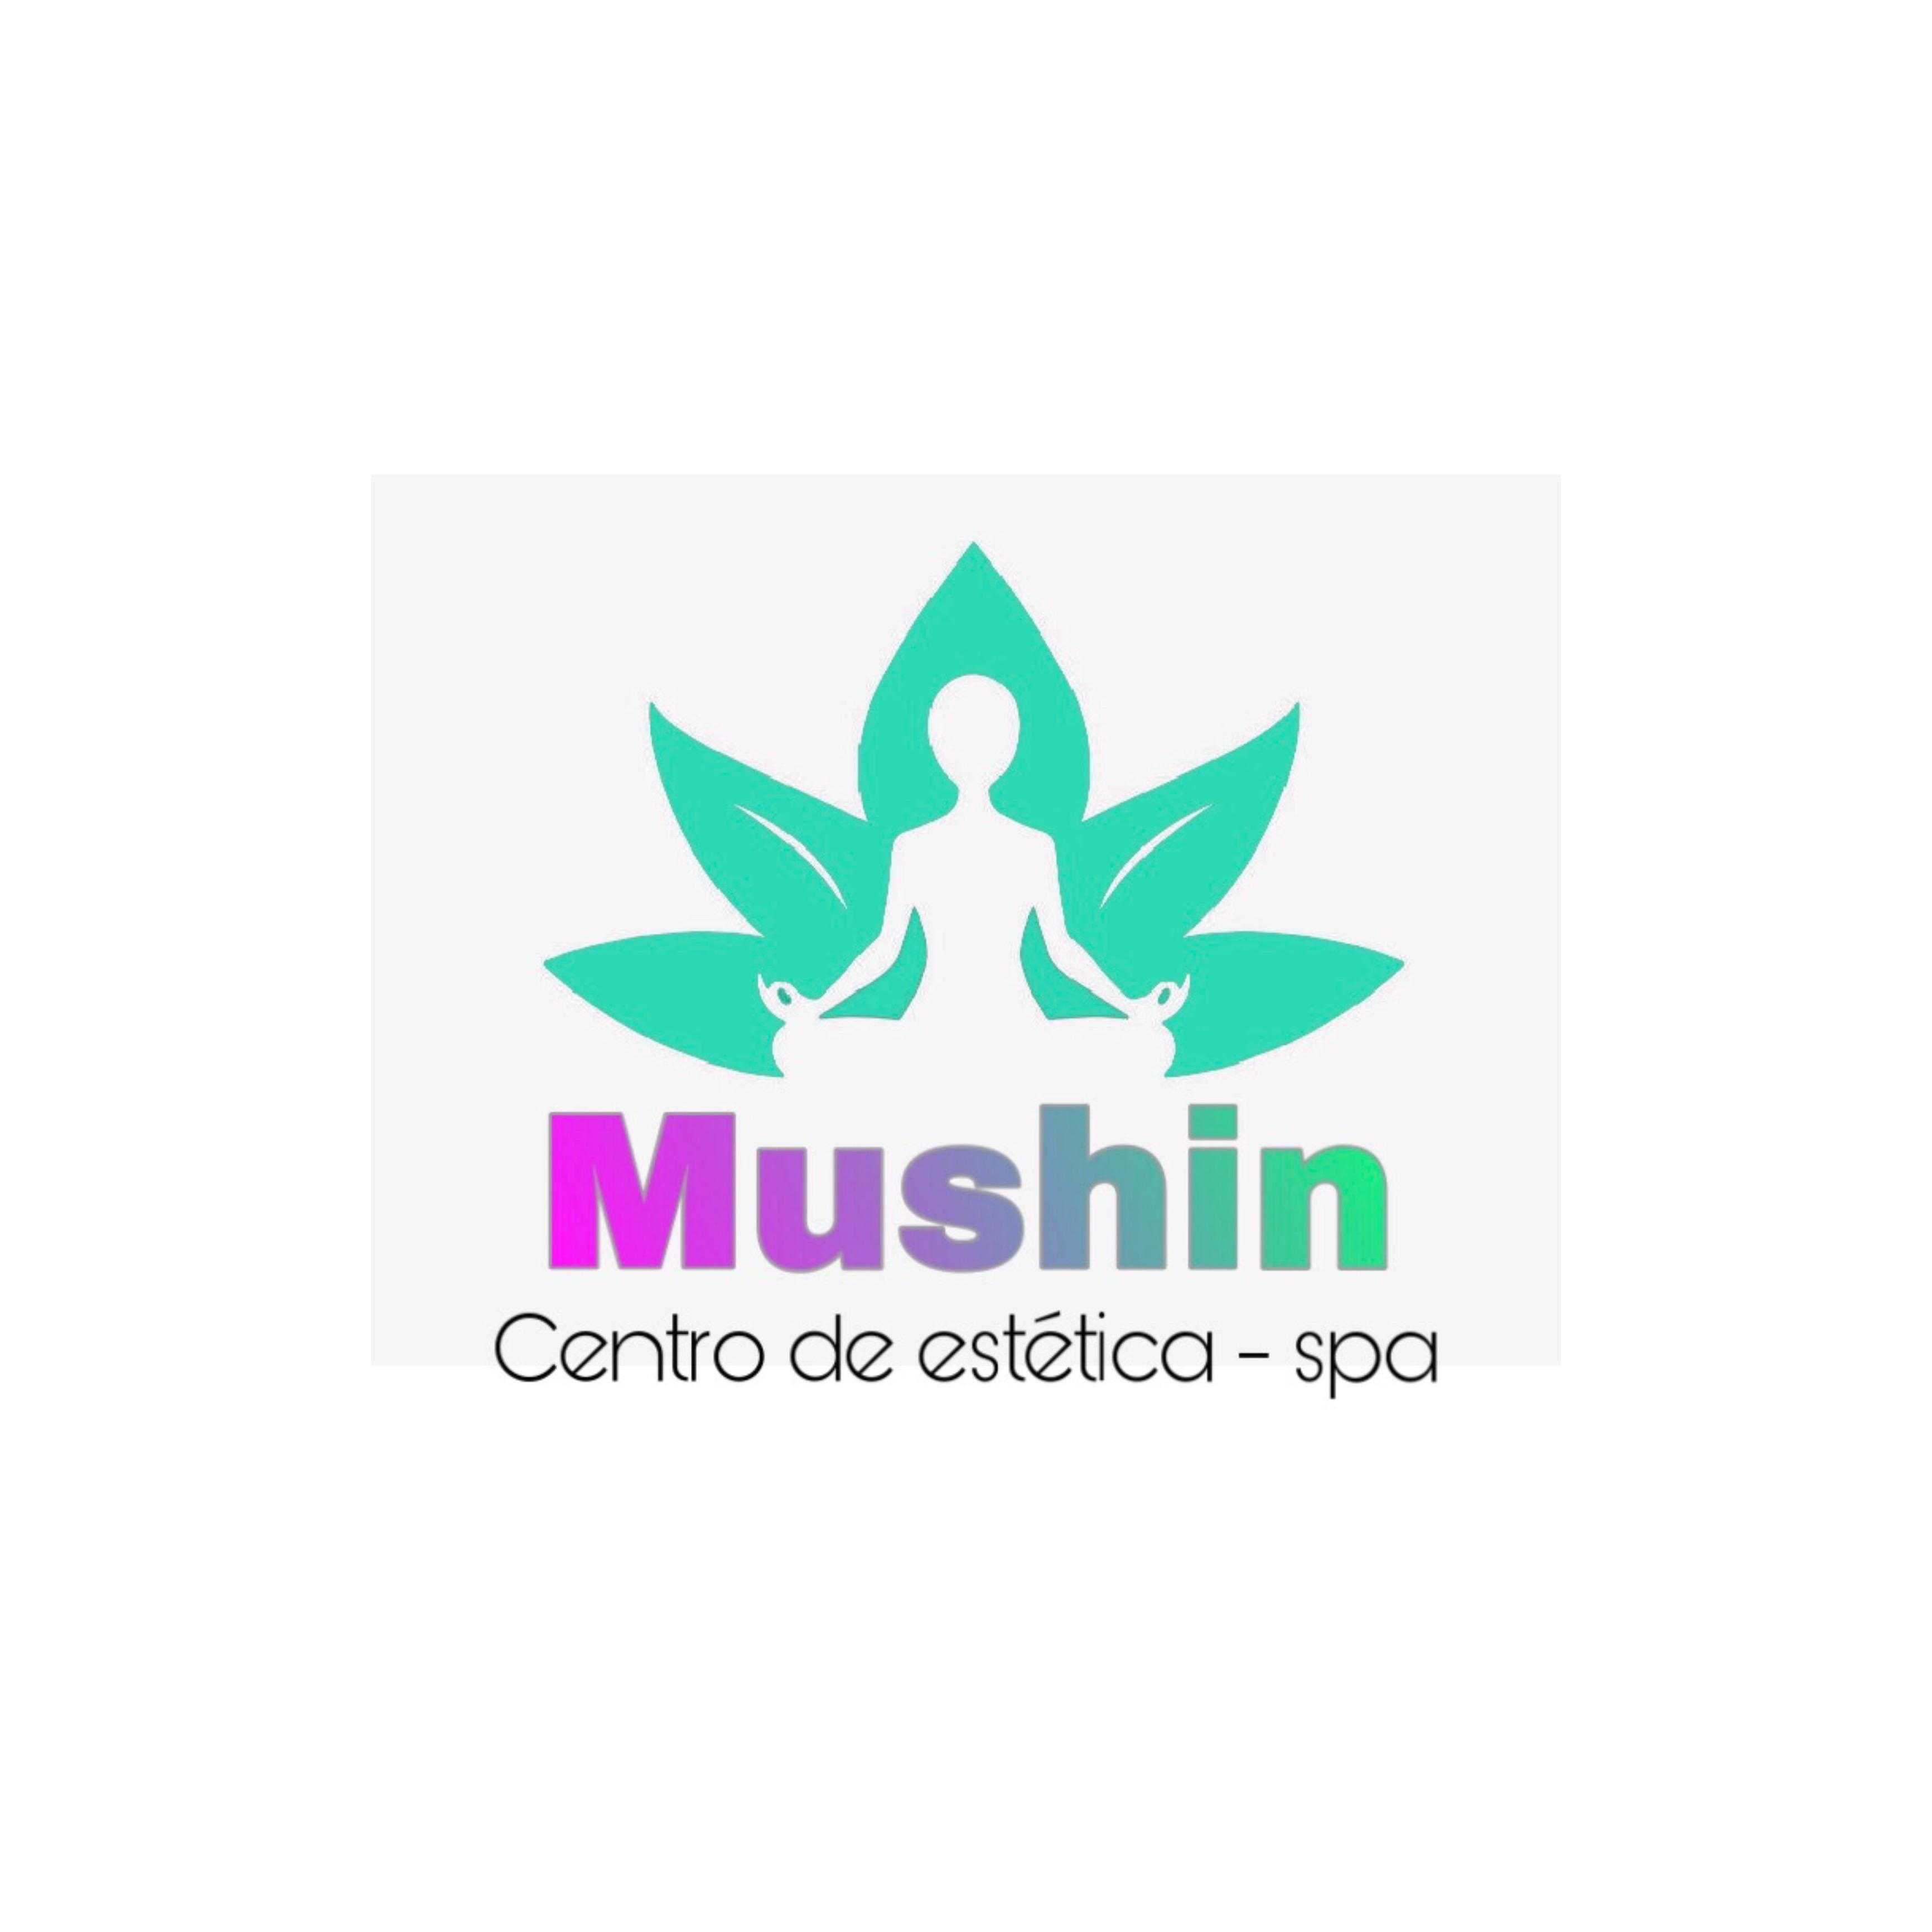 Mushin estética spa